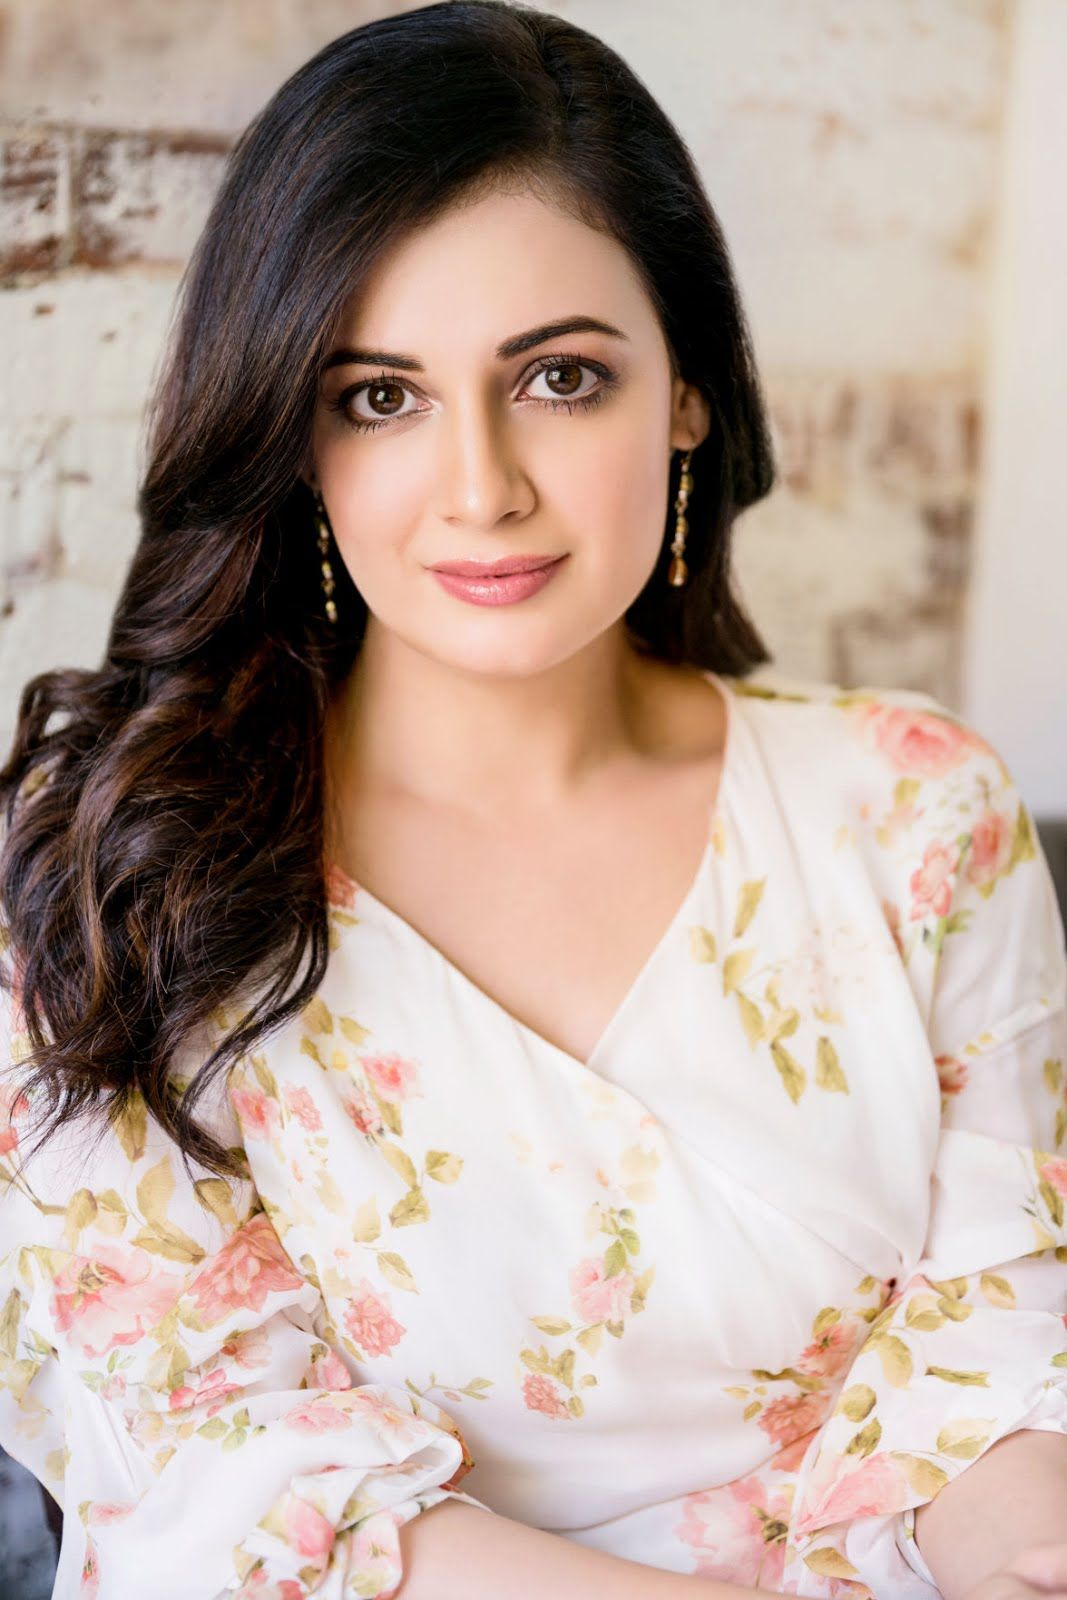 Hot Sexy Bollywood Actress Top 15 Most Beautiful Indian Women Of 2018 Hd Photos